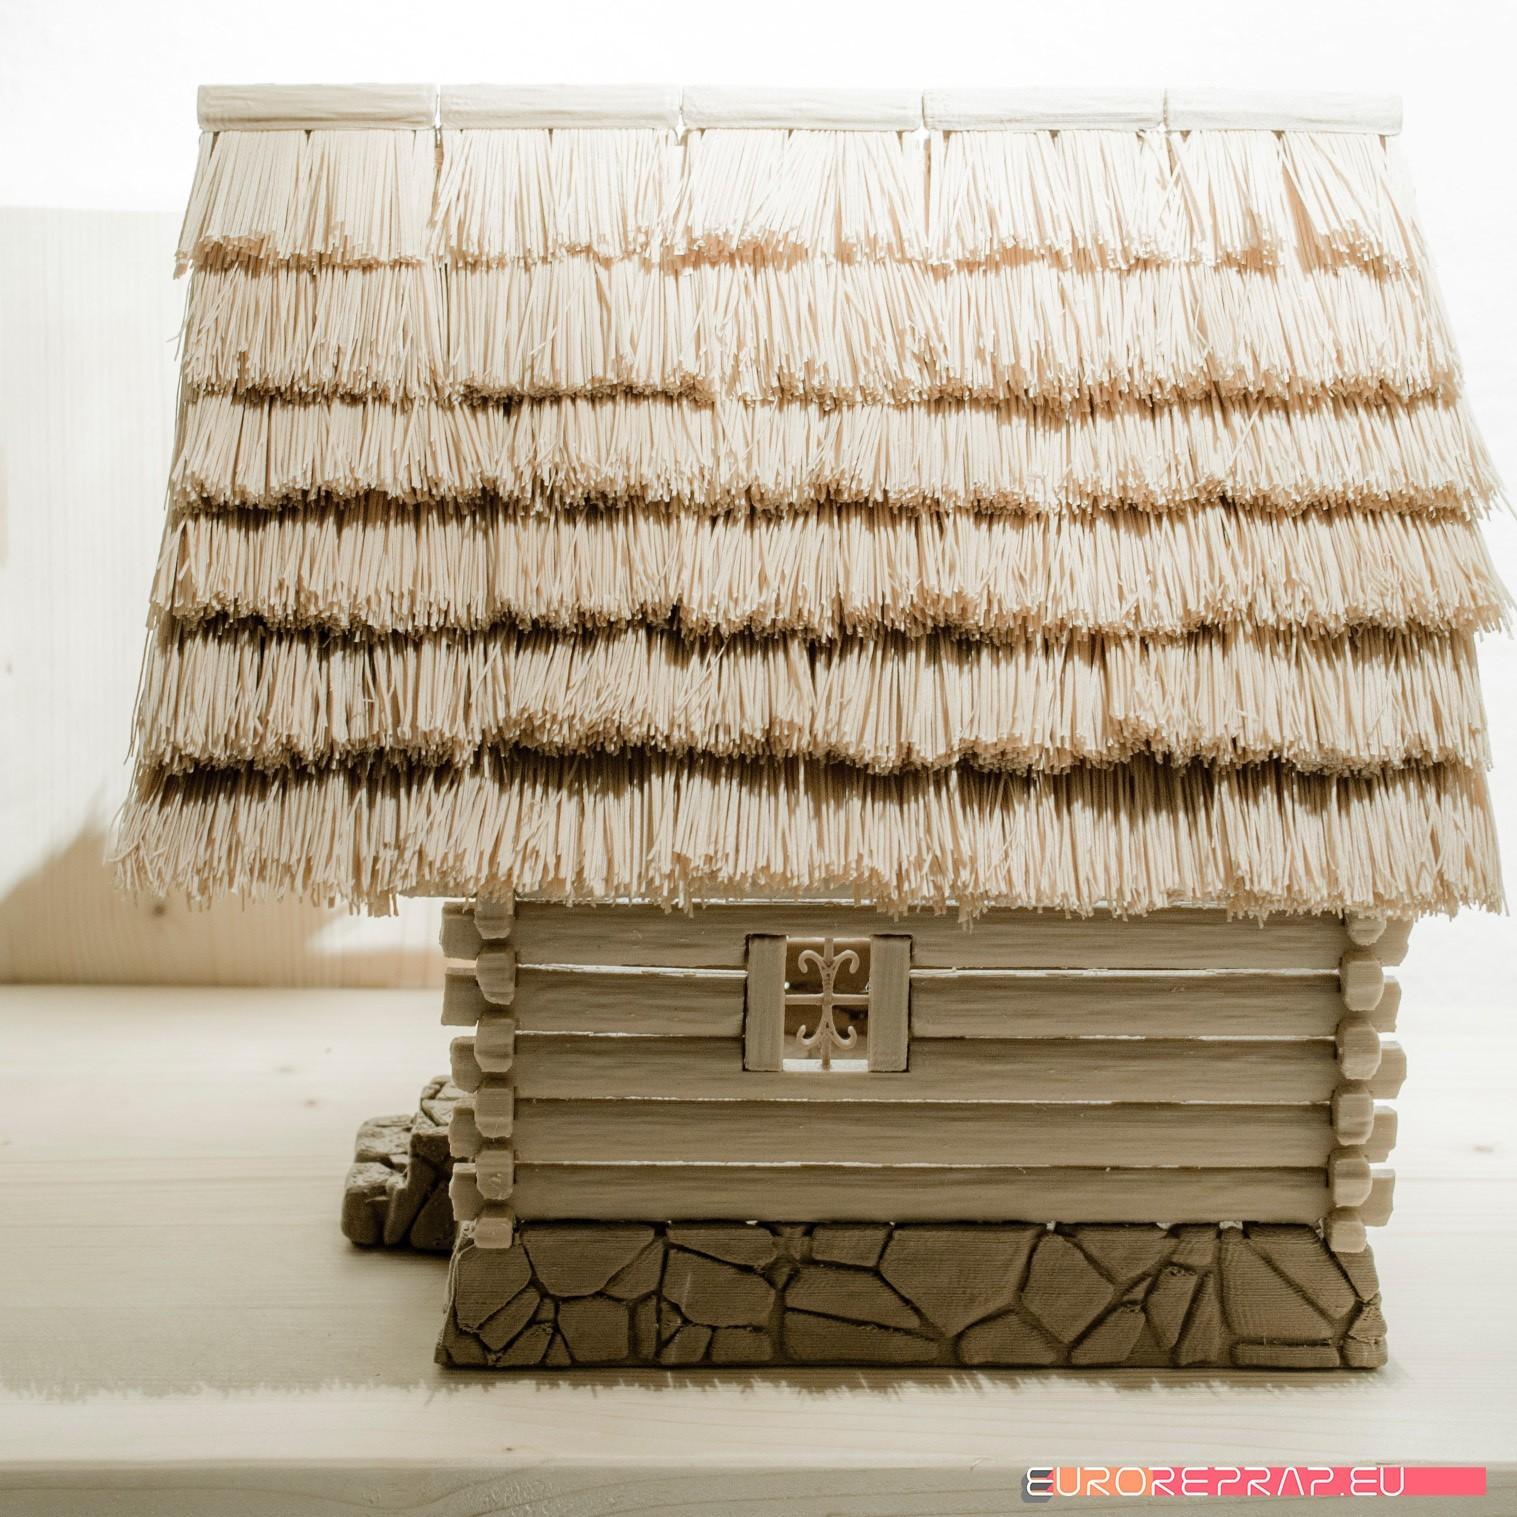 P07.jpg Download STL file 3D printed house - log cabin - cottage • 3D printable template, euroreprap_eu